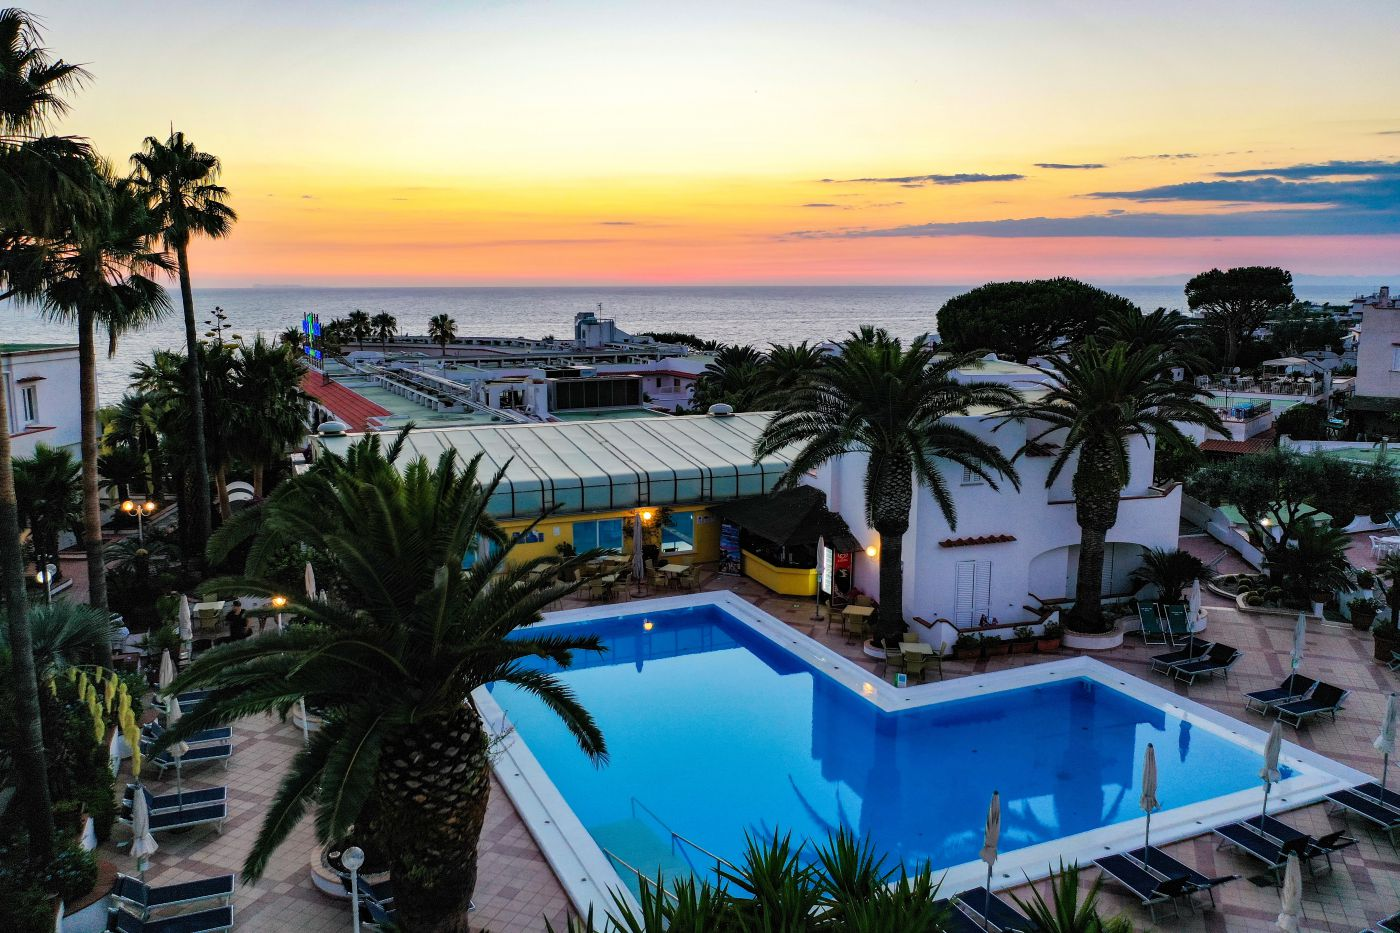 Hotel Terme Royal Palm Ischia